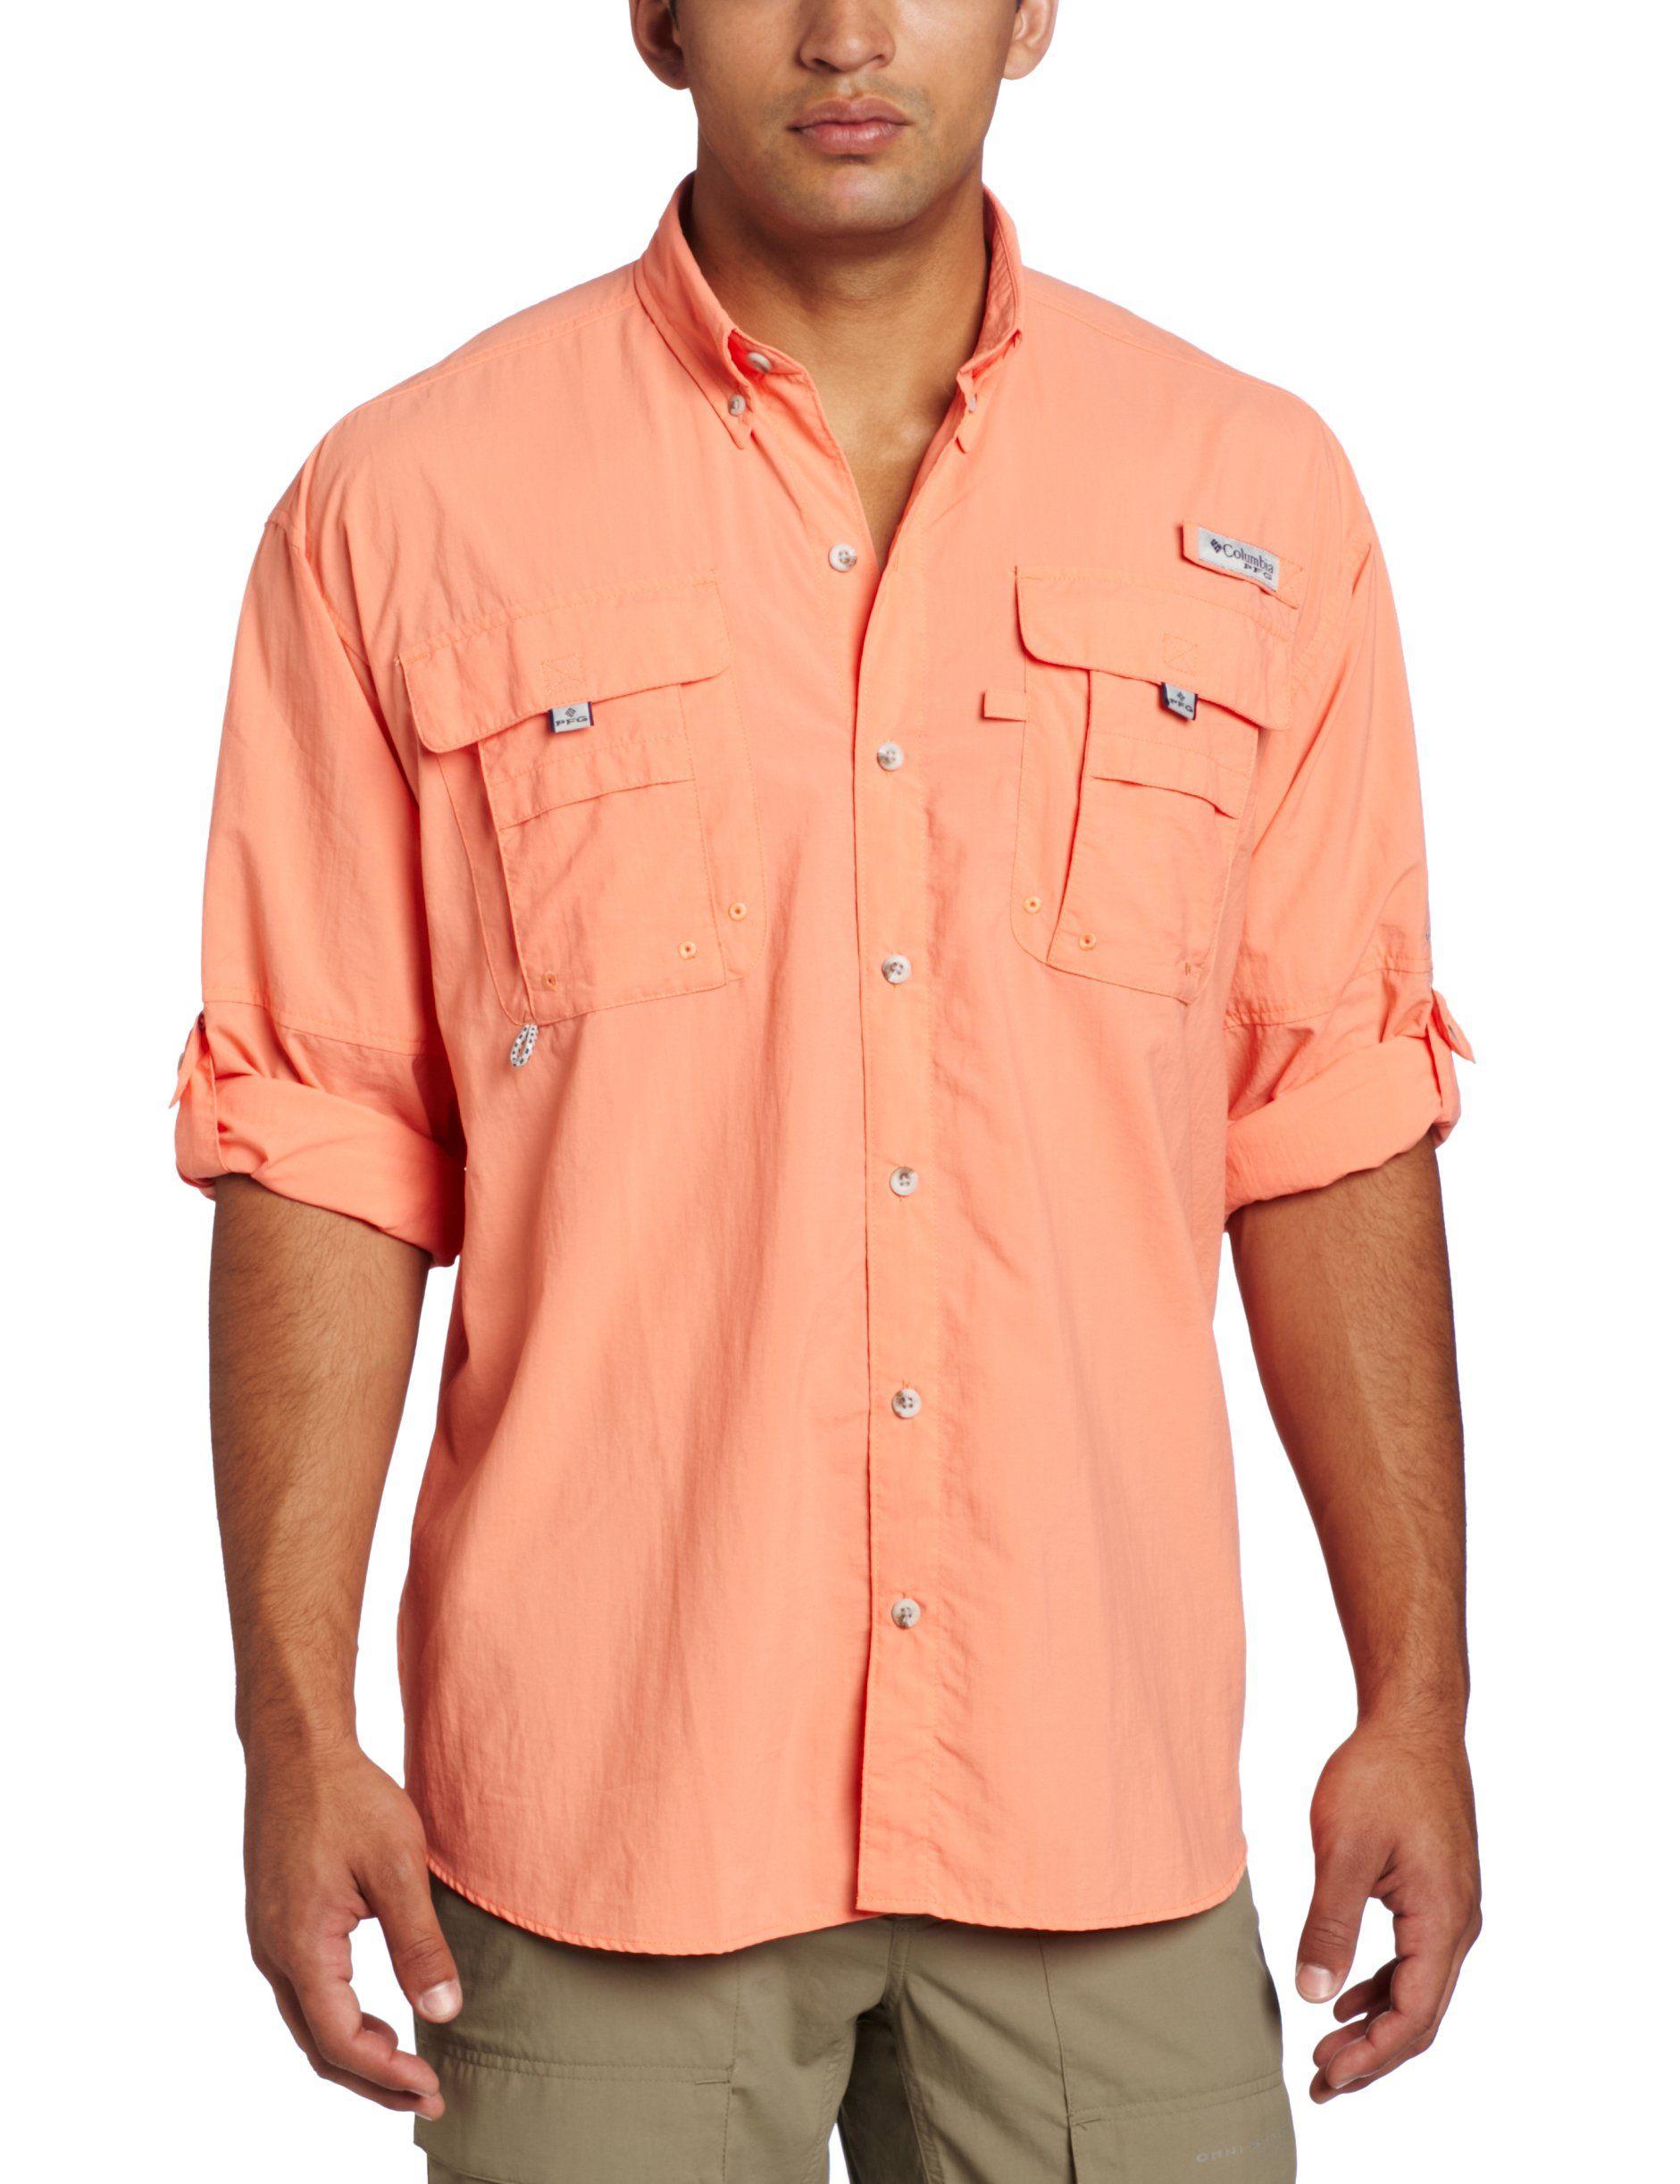 COLUMBIA Men's PFG Bonehead Long Sleeve Shirt Fishing Shirt Key West Large